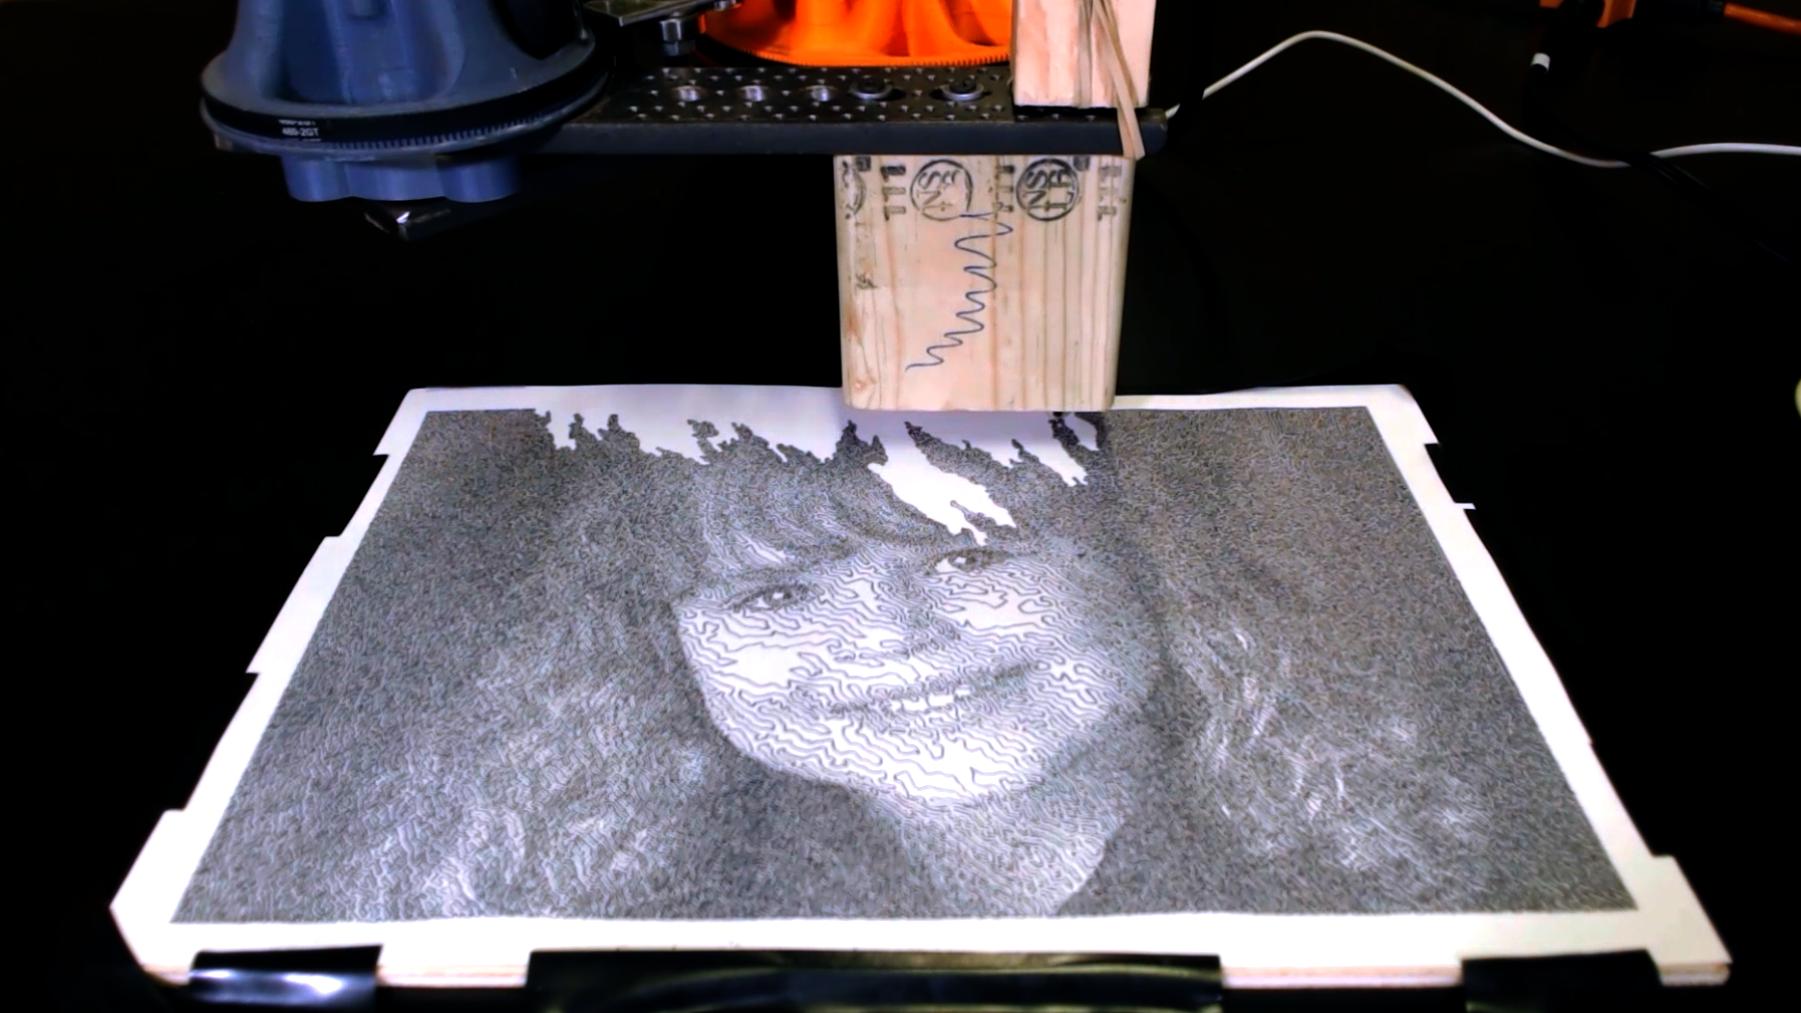 TSP Art drawn by evezor robotic arm